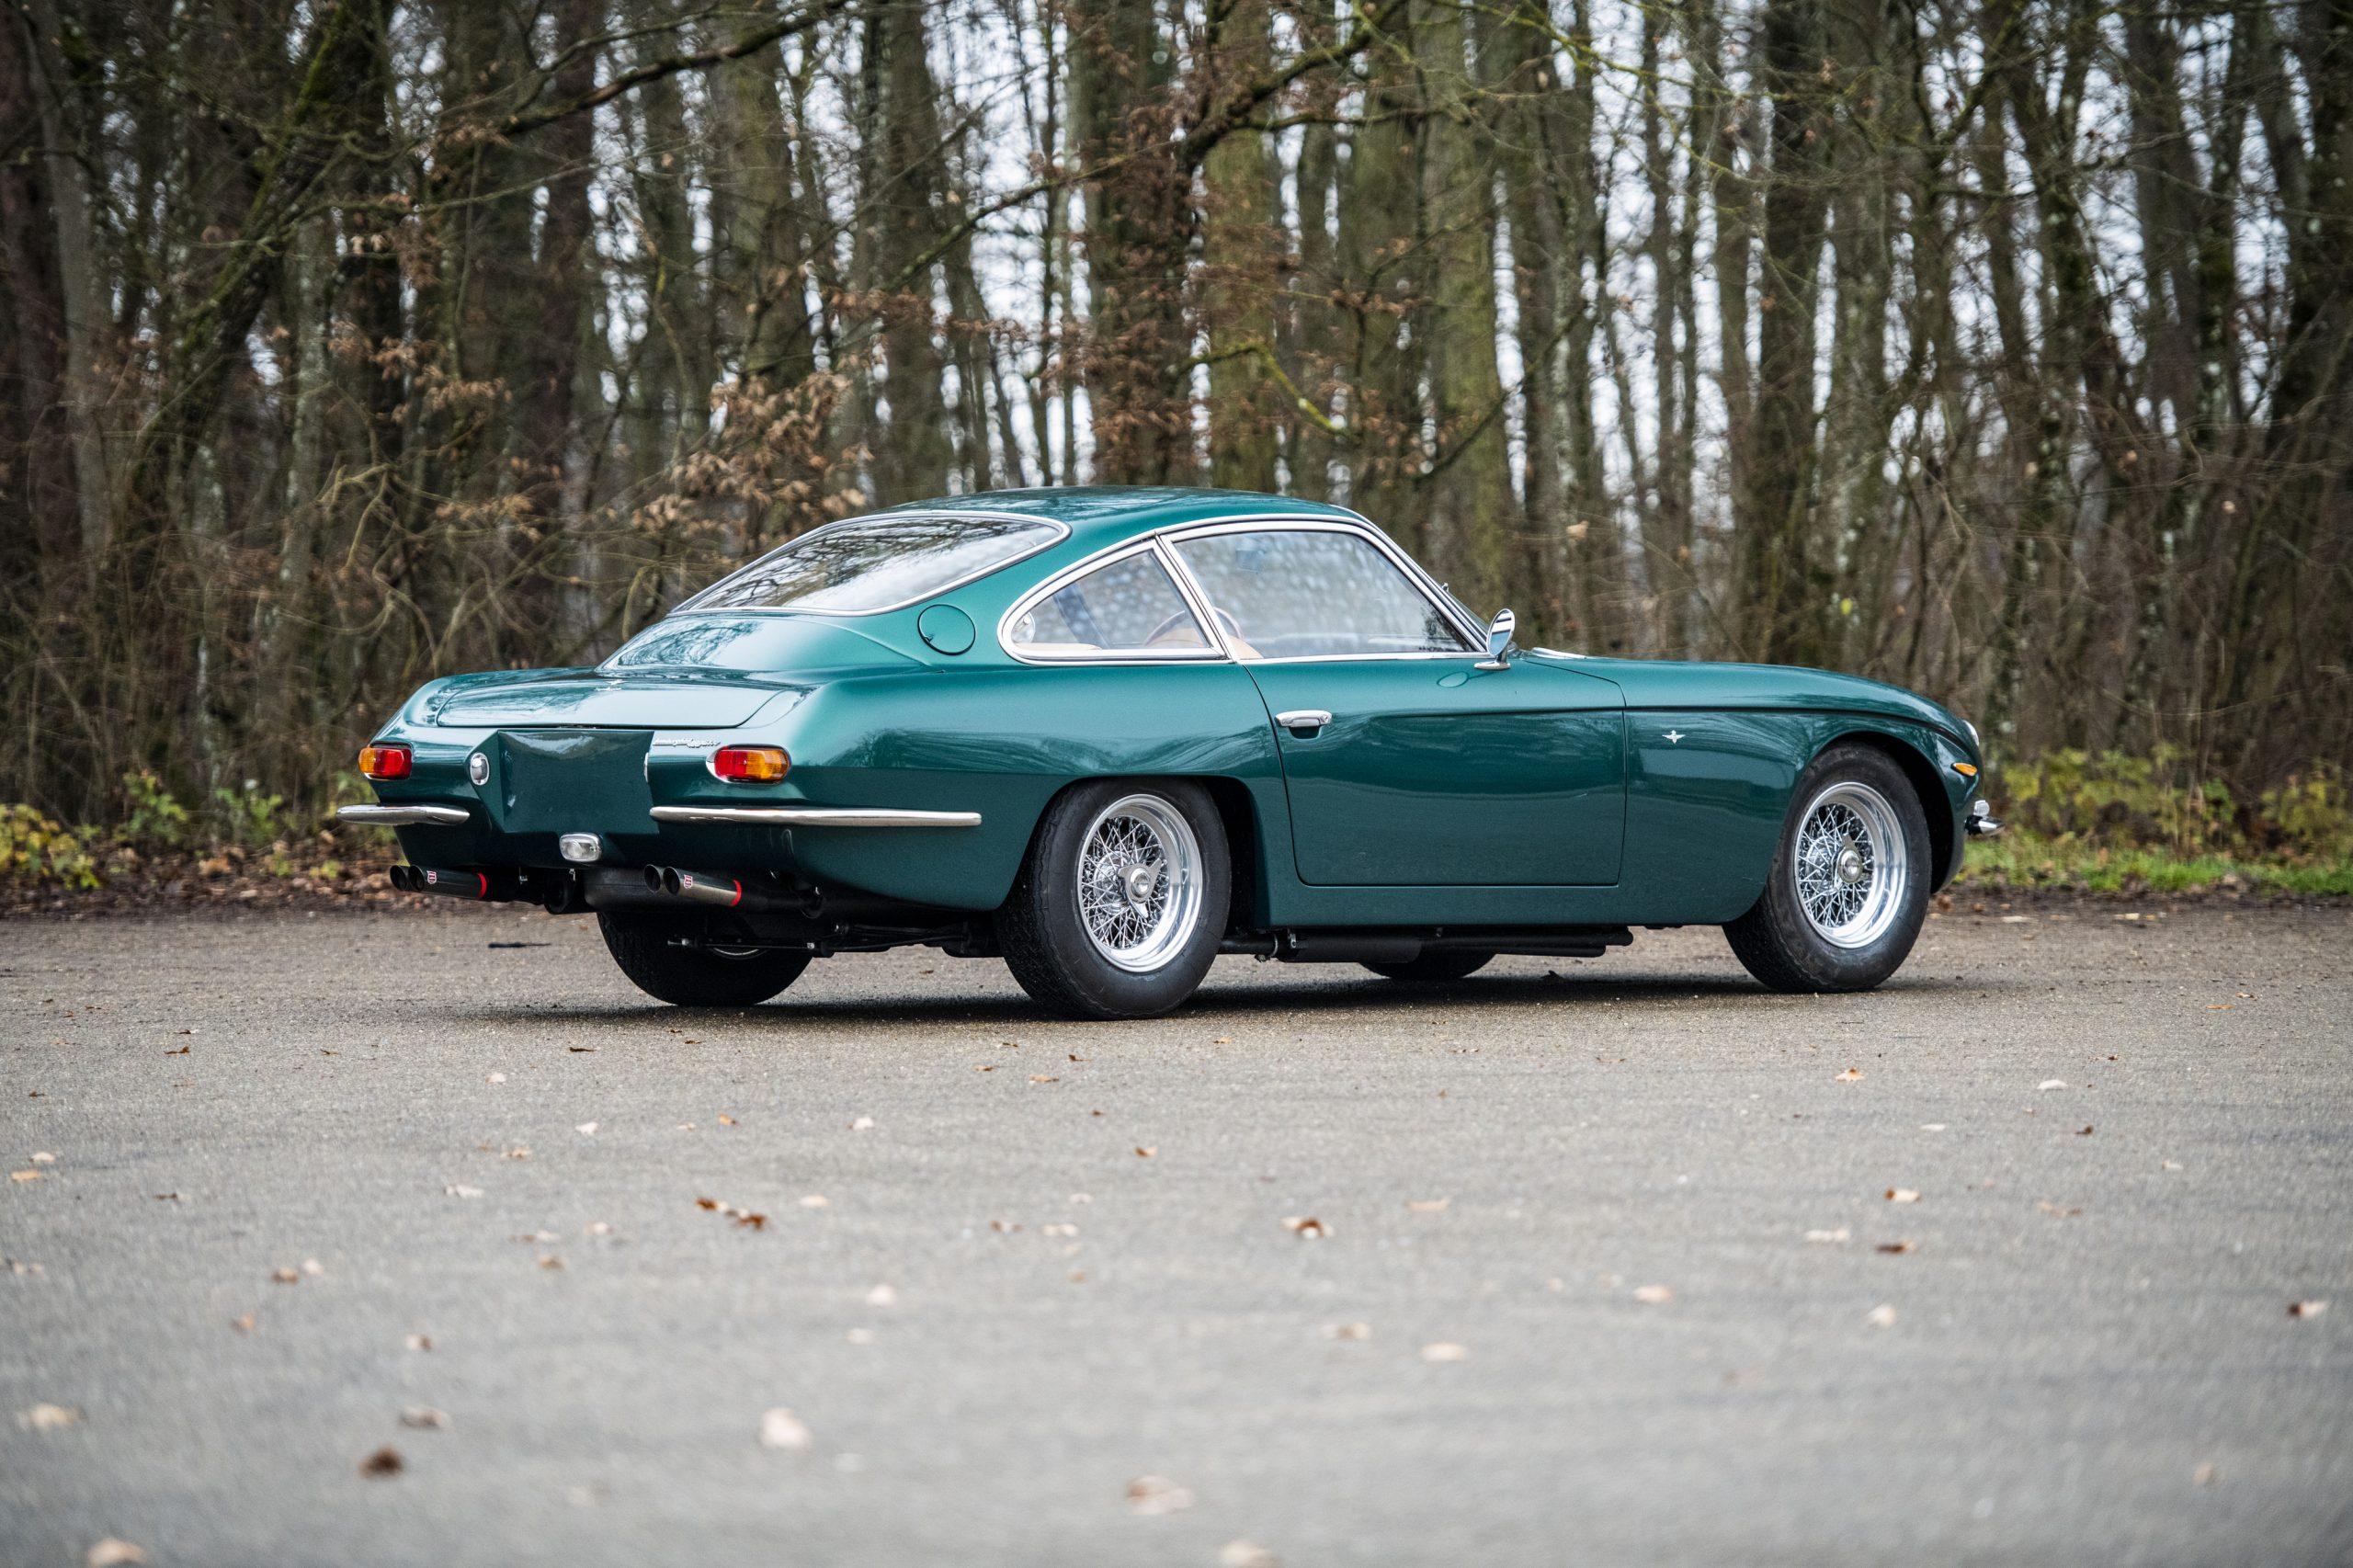 1967 Lamborghini 400 GT 2+2 rear three-quarter